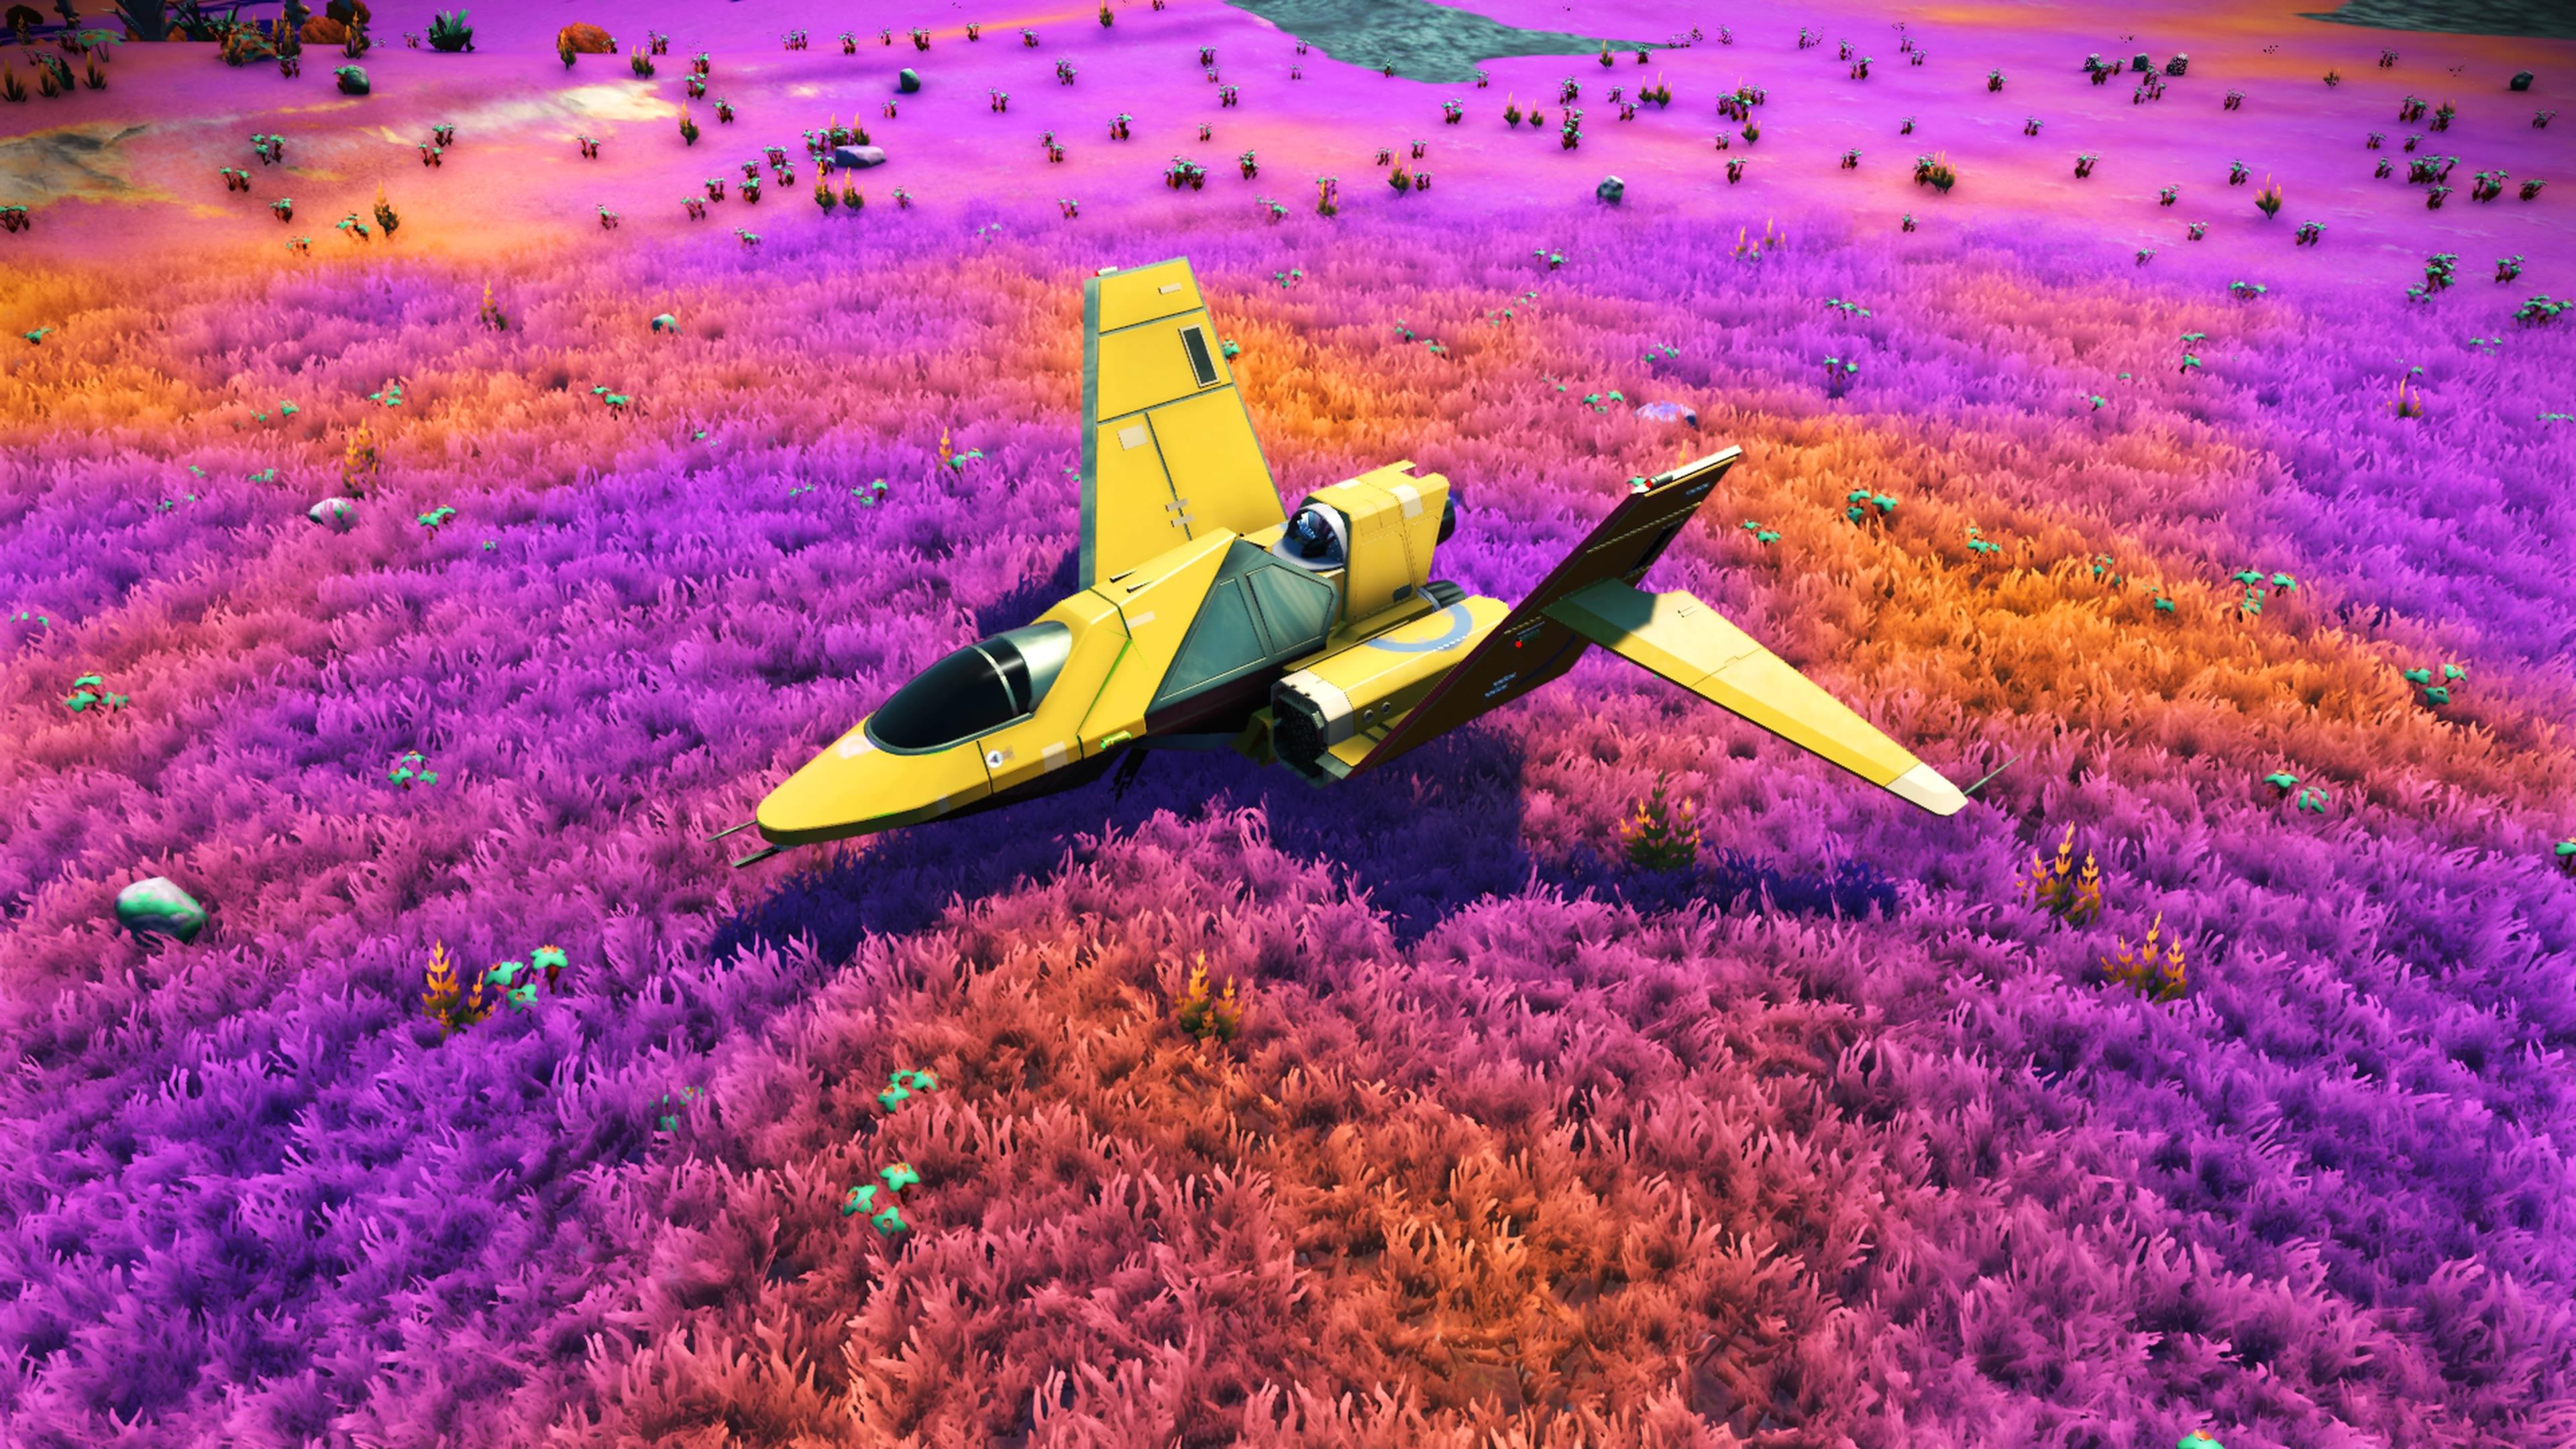 No Man S Sky 4k Wallpaper: No Mans Sky Game Plane Colorful Fields 4k, HD Games, 4k